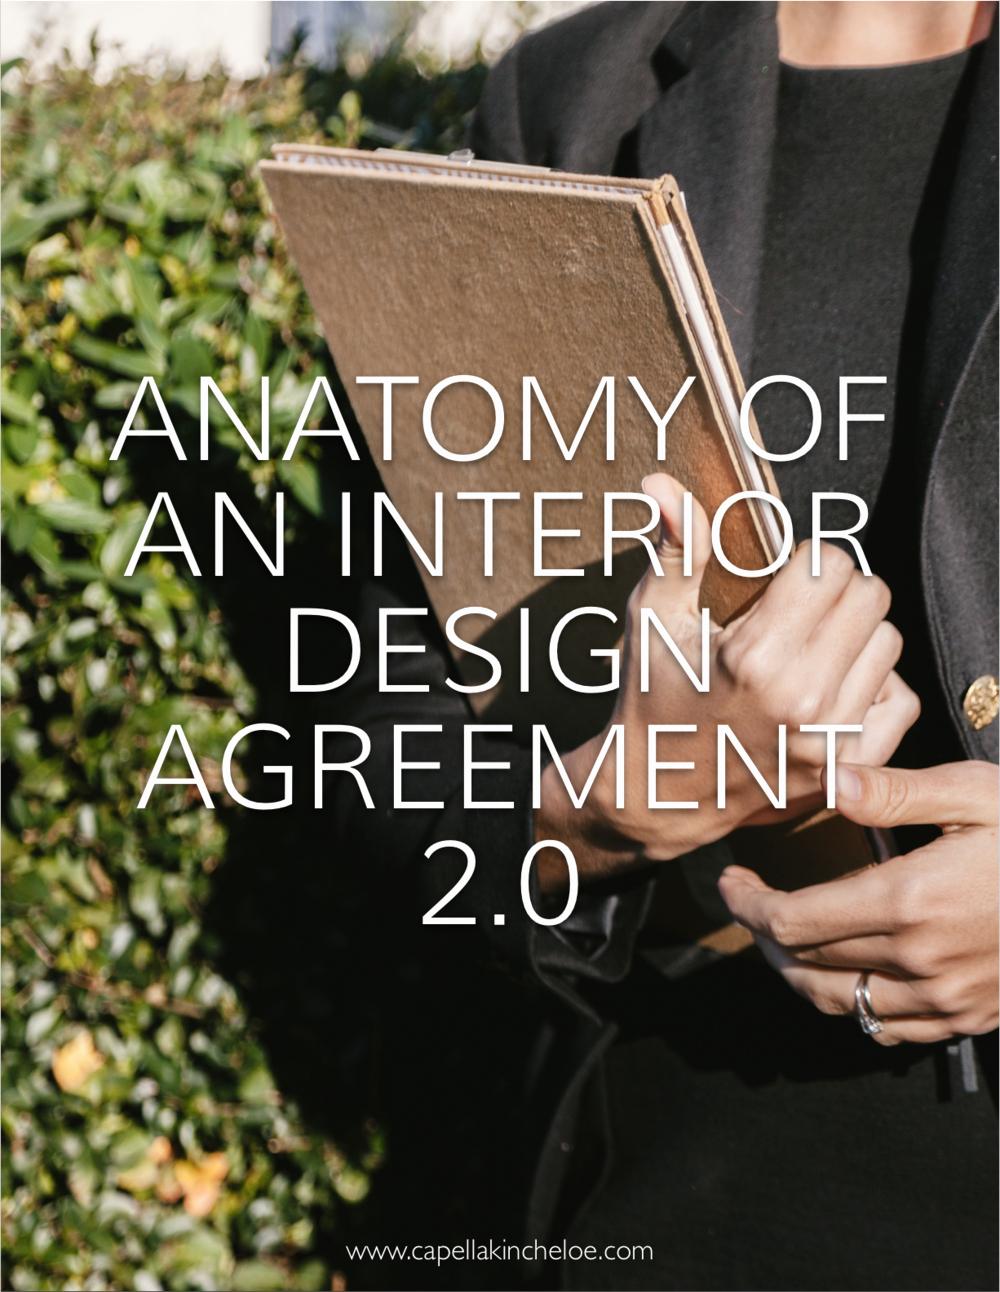 Interior Design Contract Templates Best Of Anatomy Of An Interior Design Agreement 2 0 — Capella